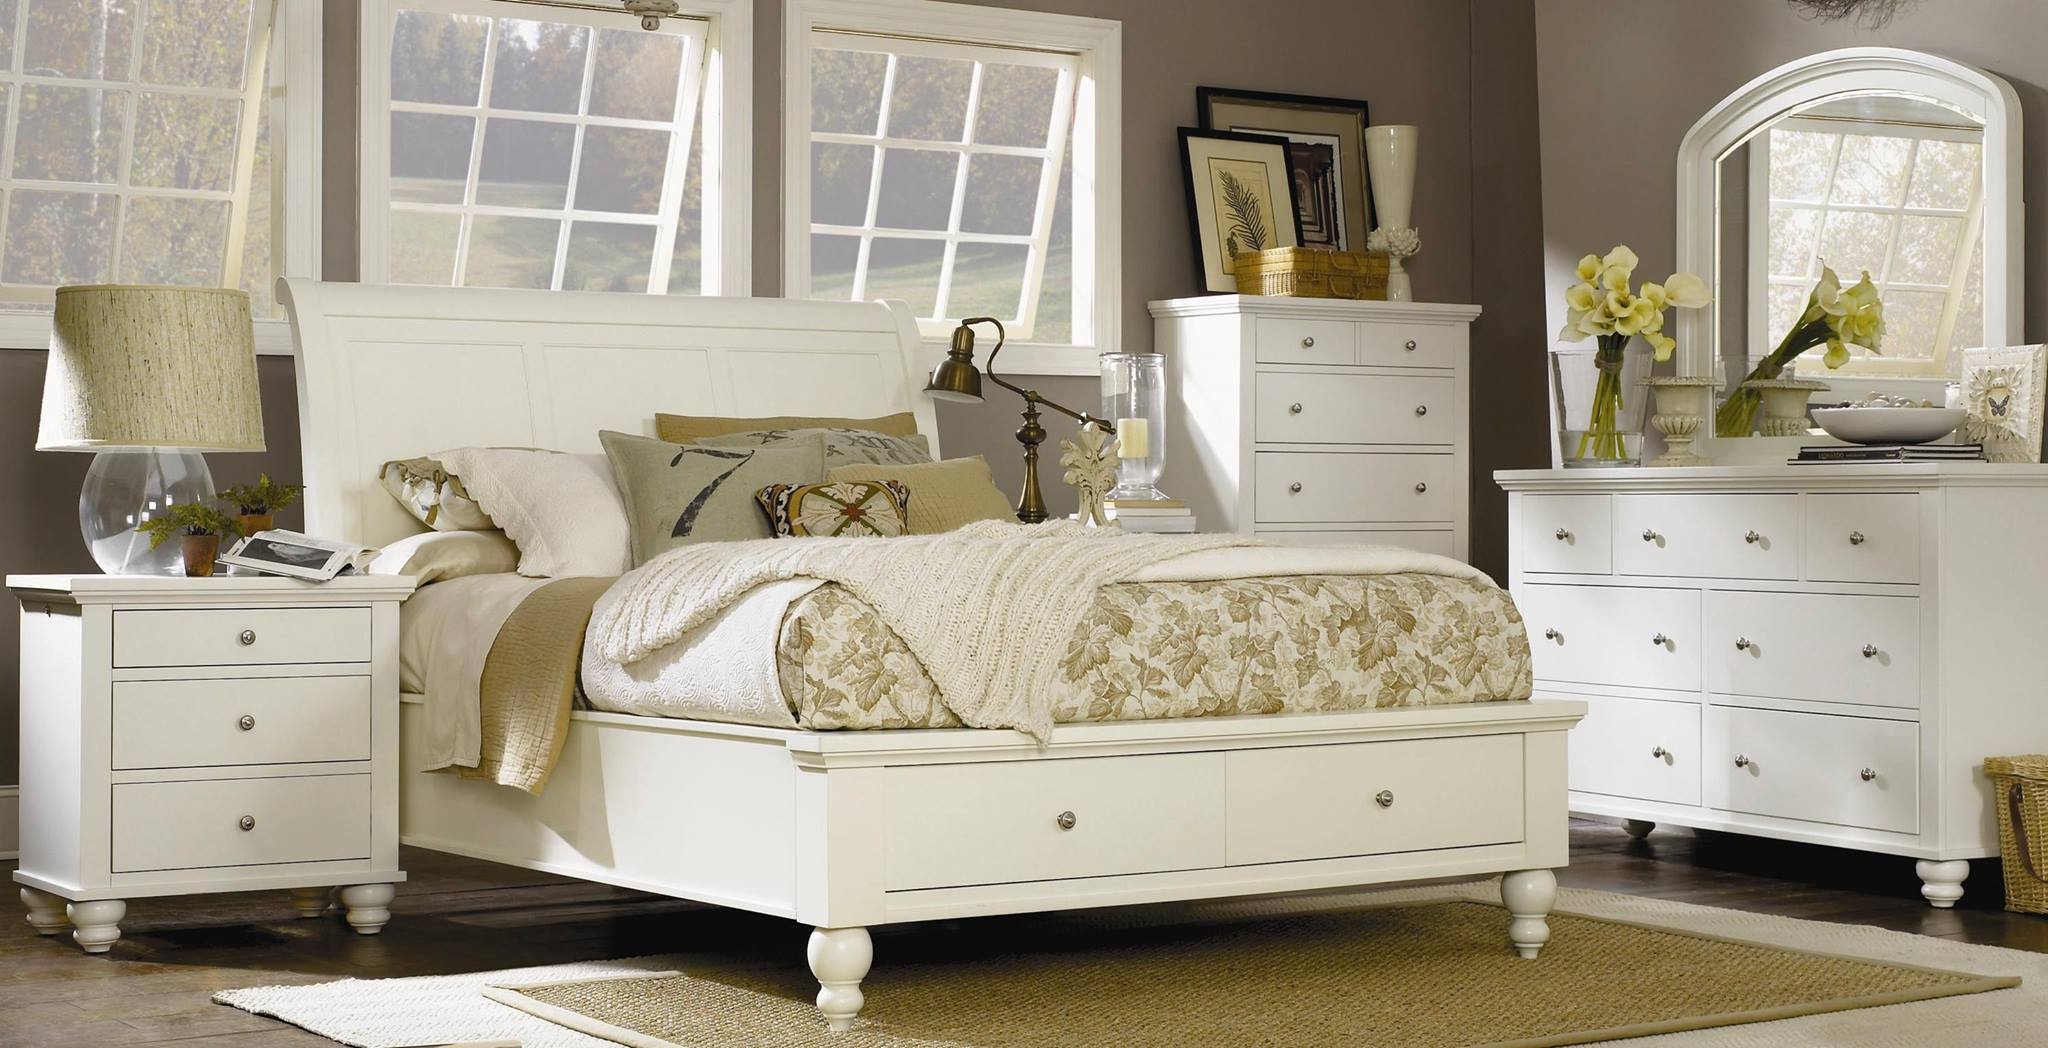 Bullard Furniture – Natural Talalay Latex Mattress Store In Fayetteville Nc